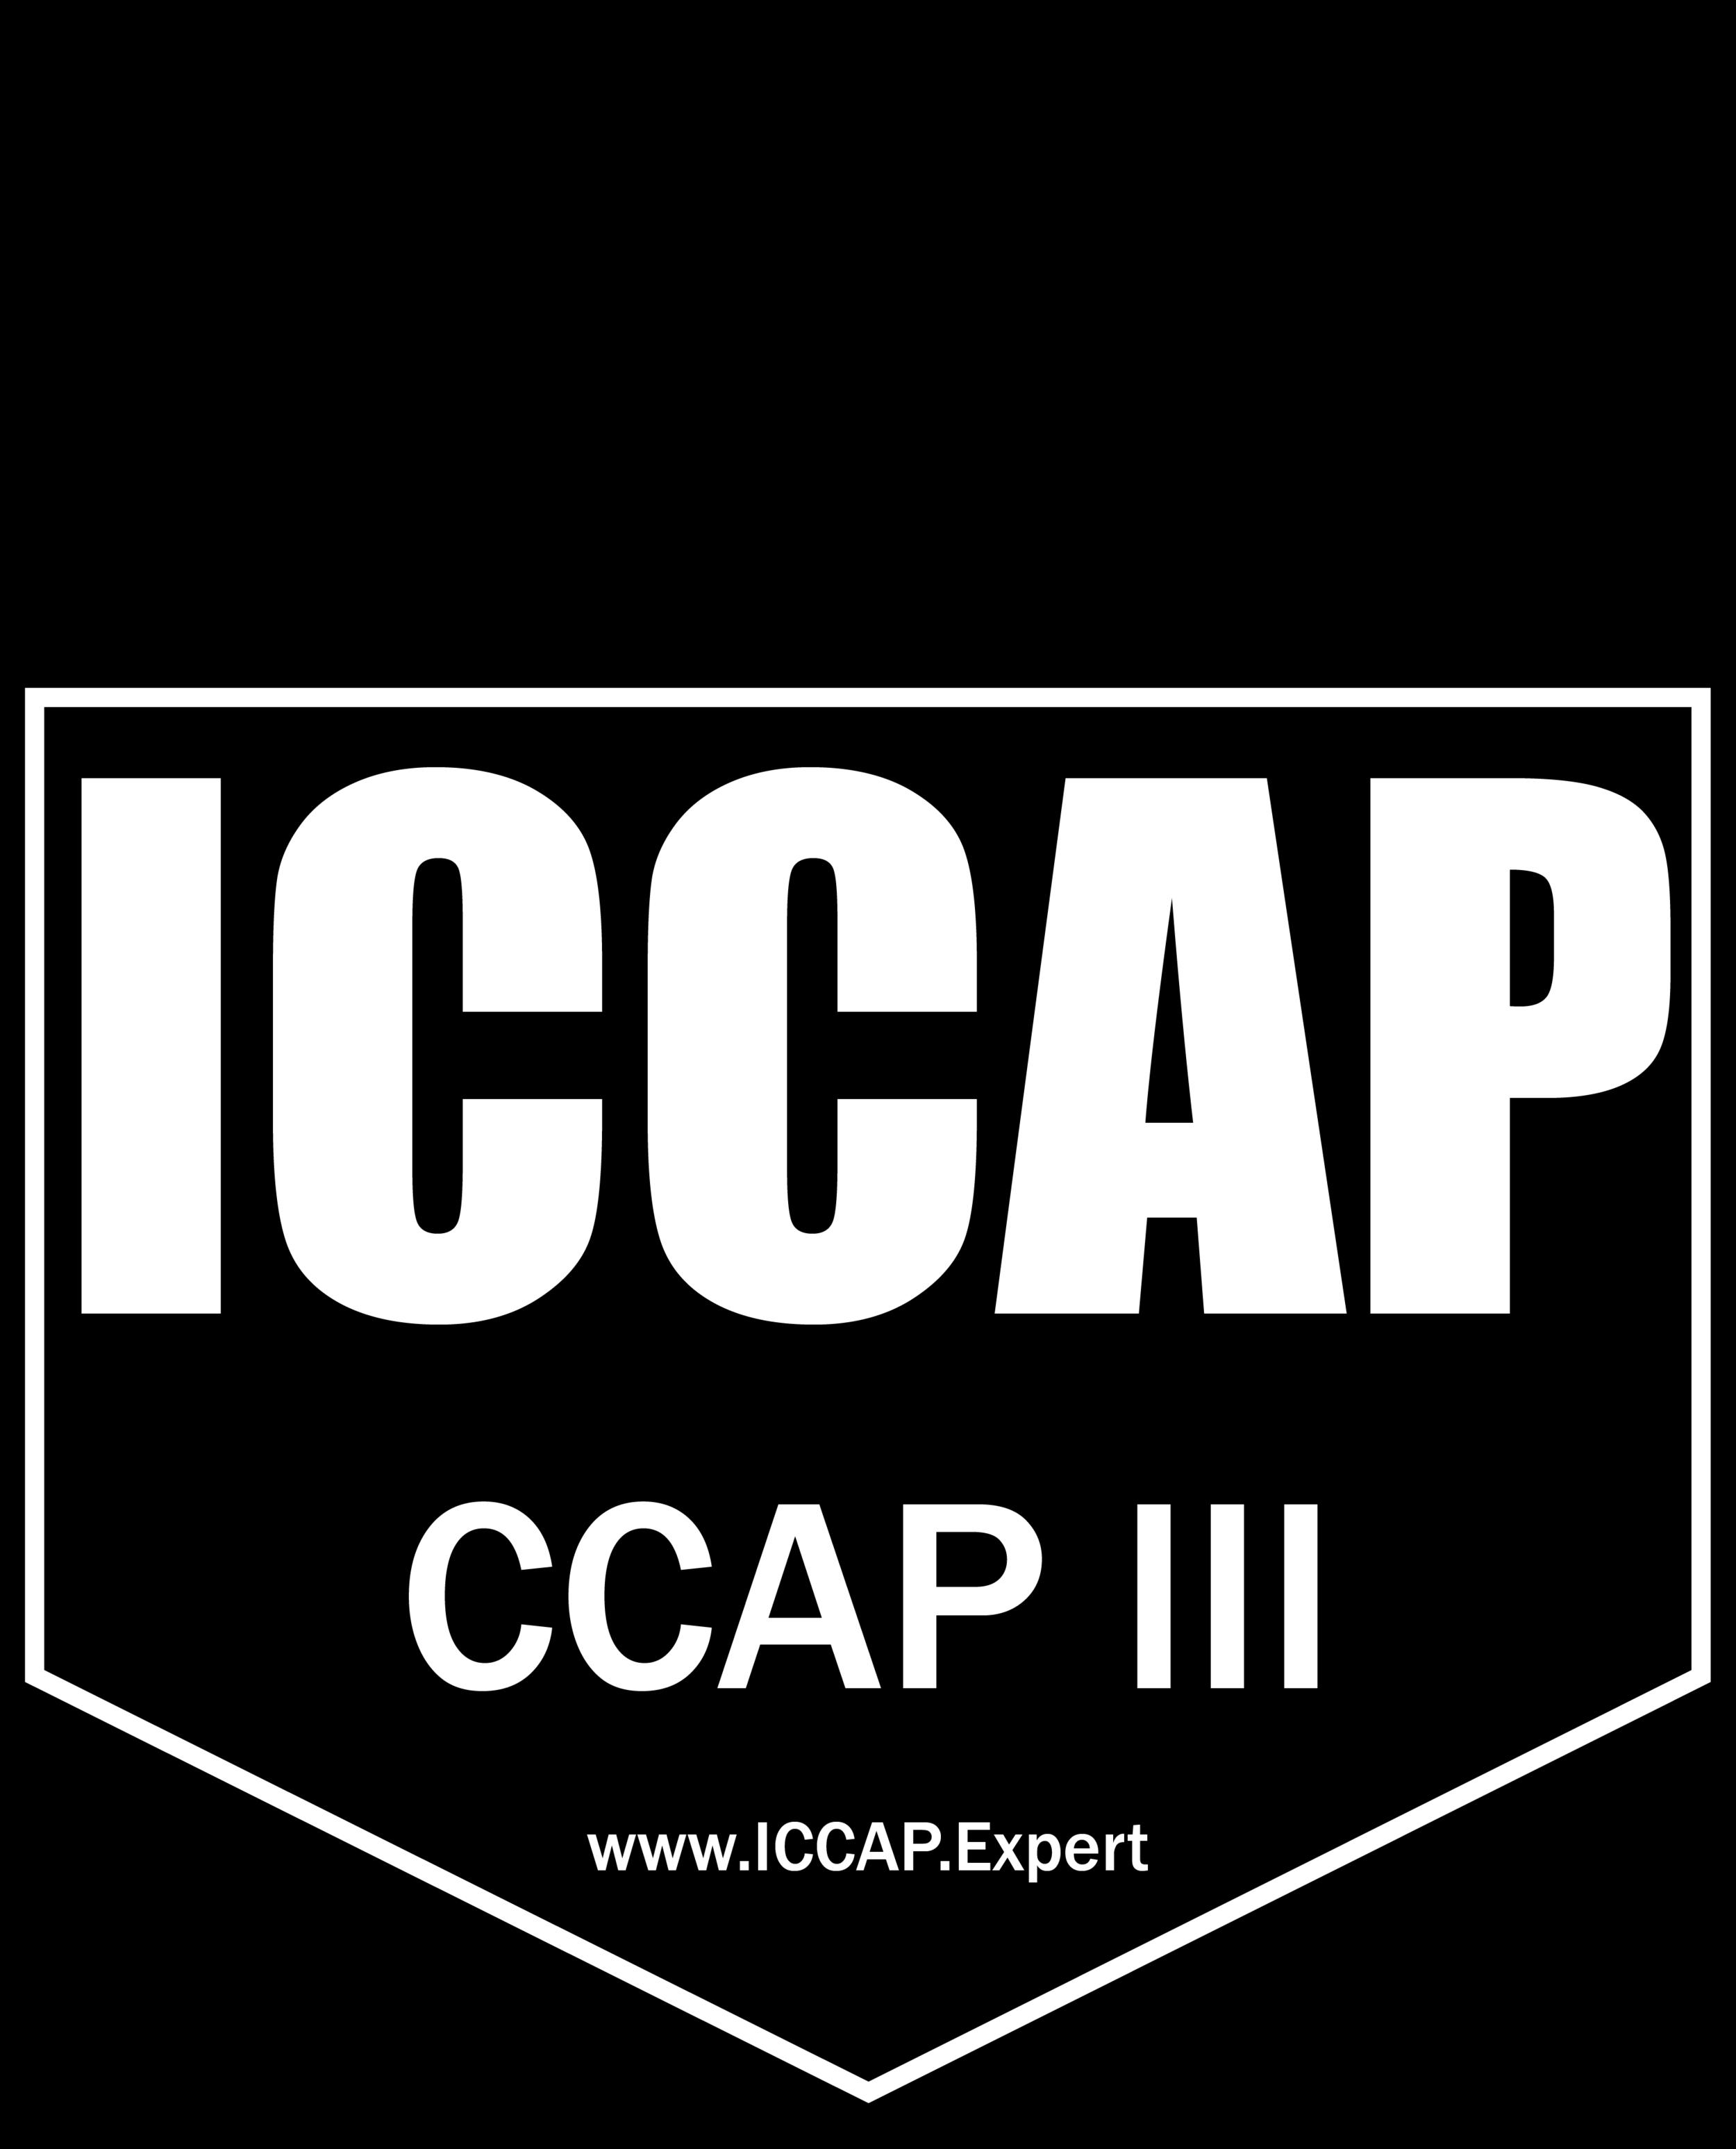 iccap-ccap-III-advocacy-marketing-certification.png